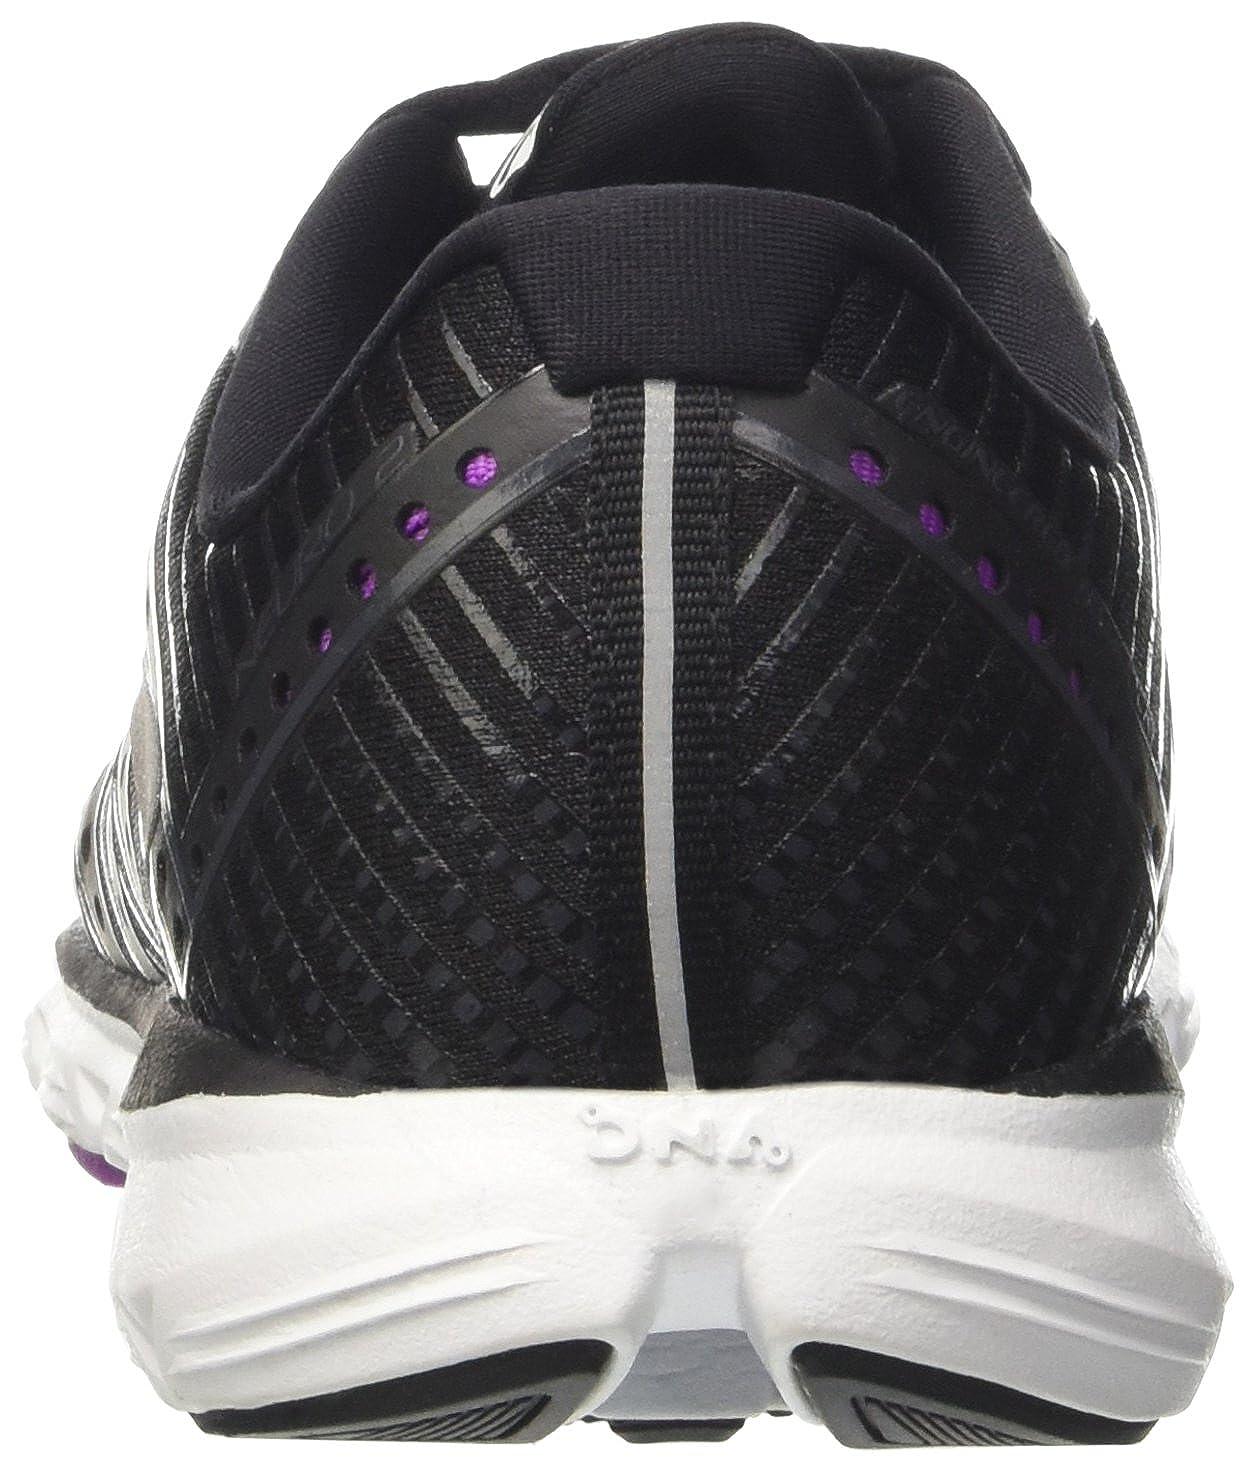 Brooks Damen Neuro 2 schwarz Laufschuhe, schwarz 2 Mehrfarbig (schwarz/Purplecactusflower/Weiß) 36aeda